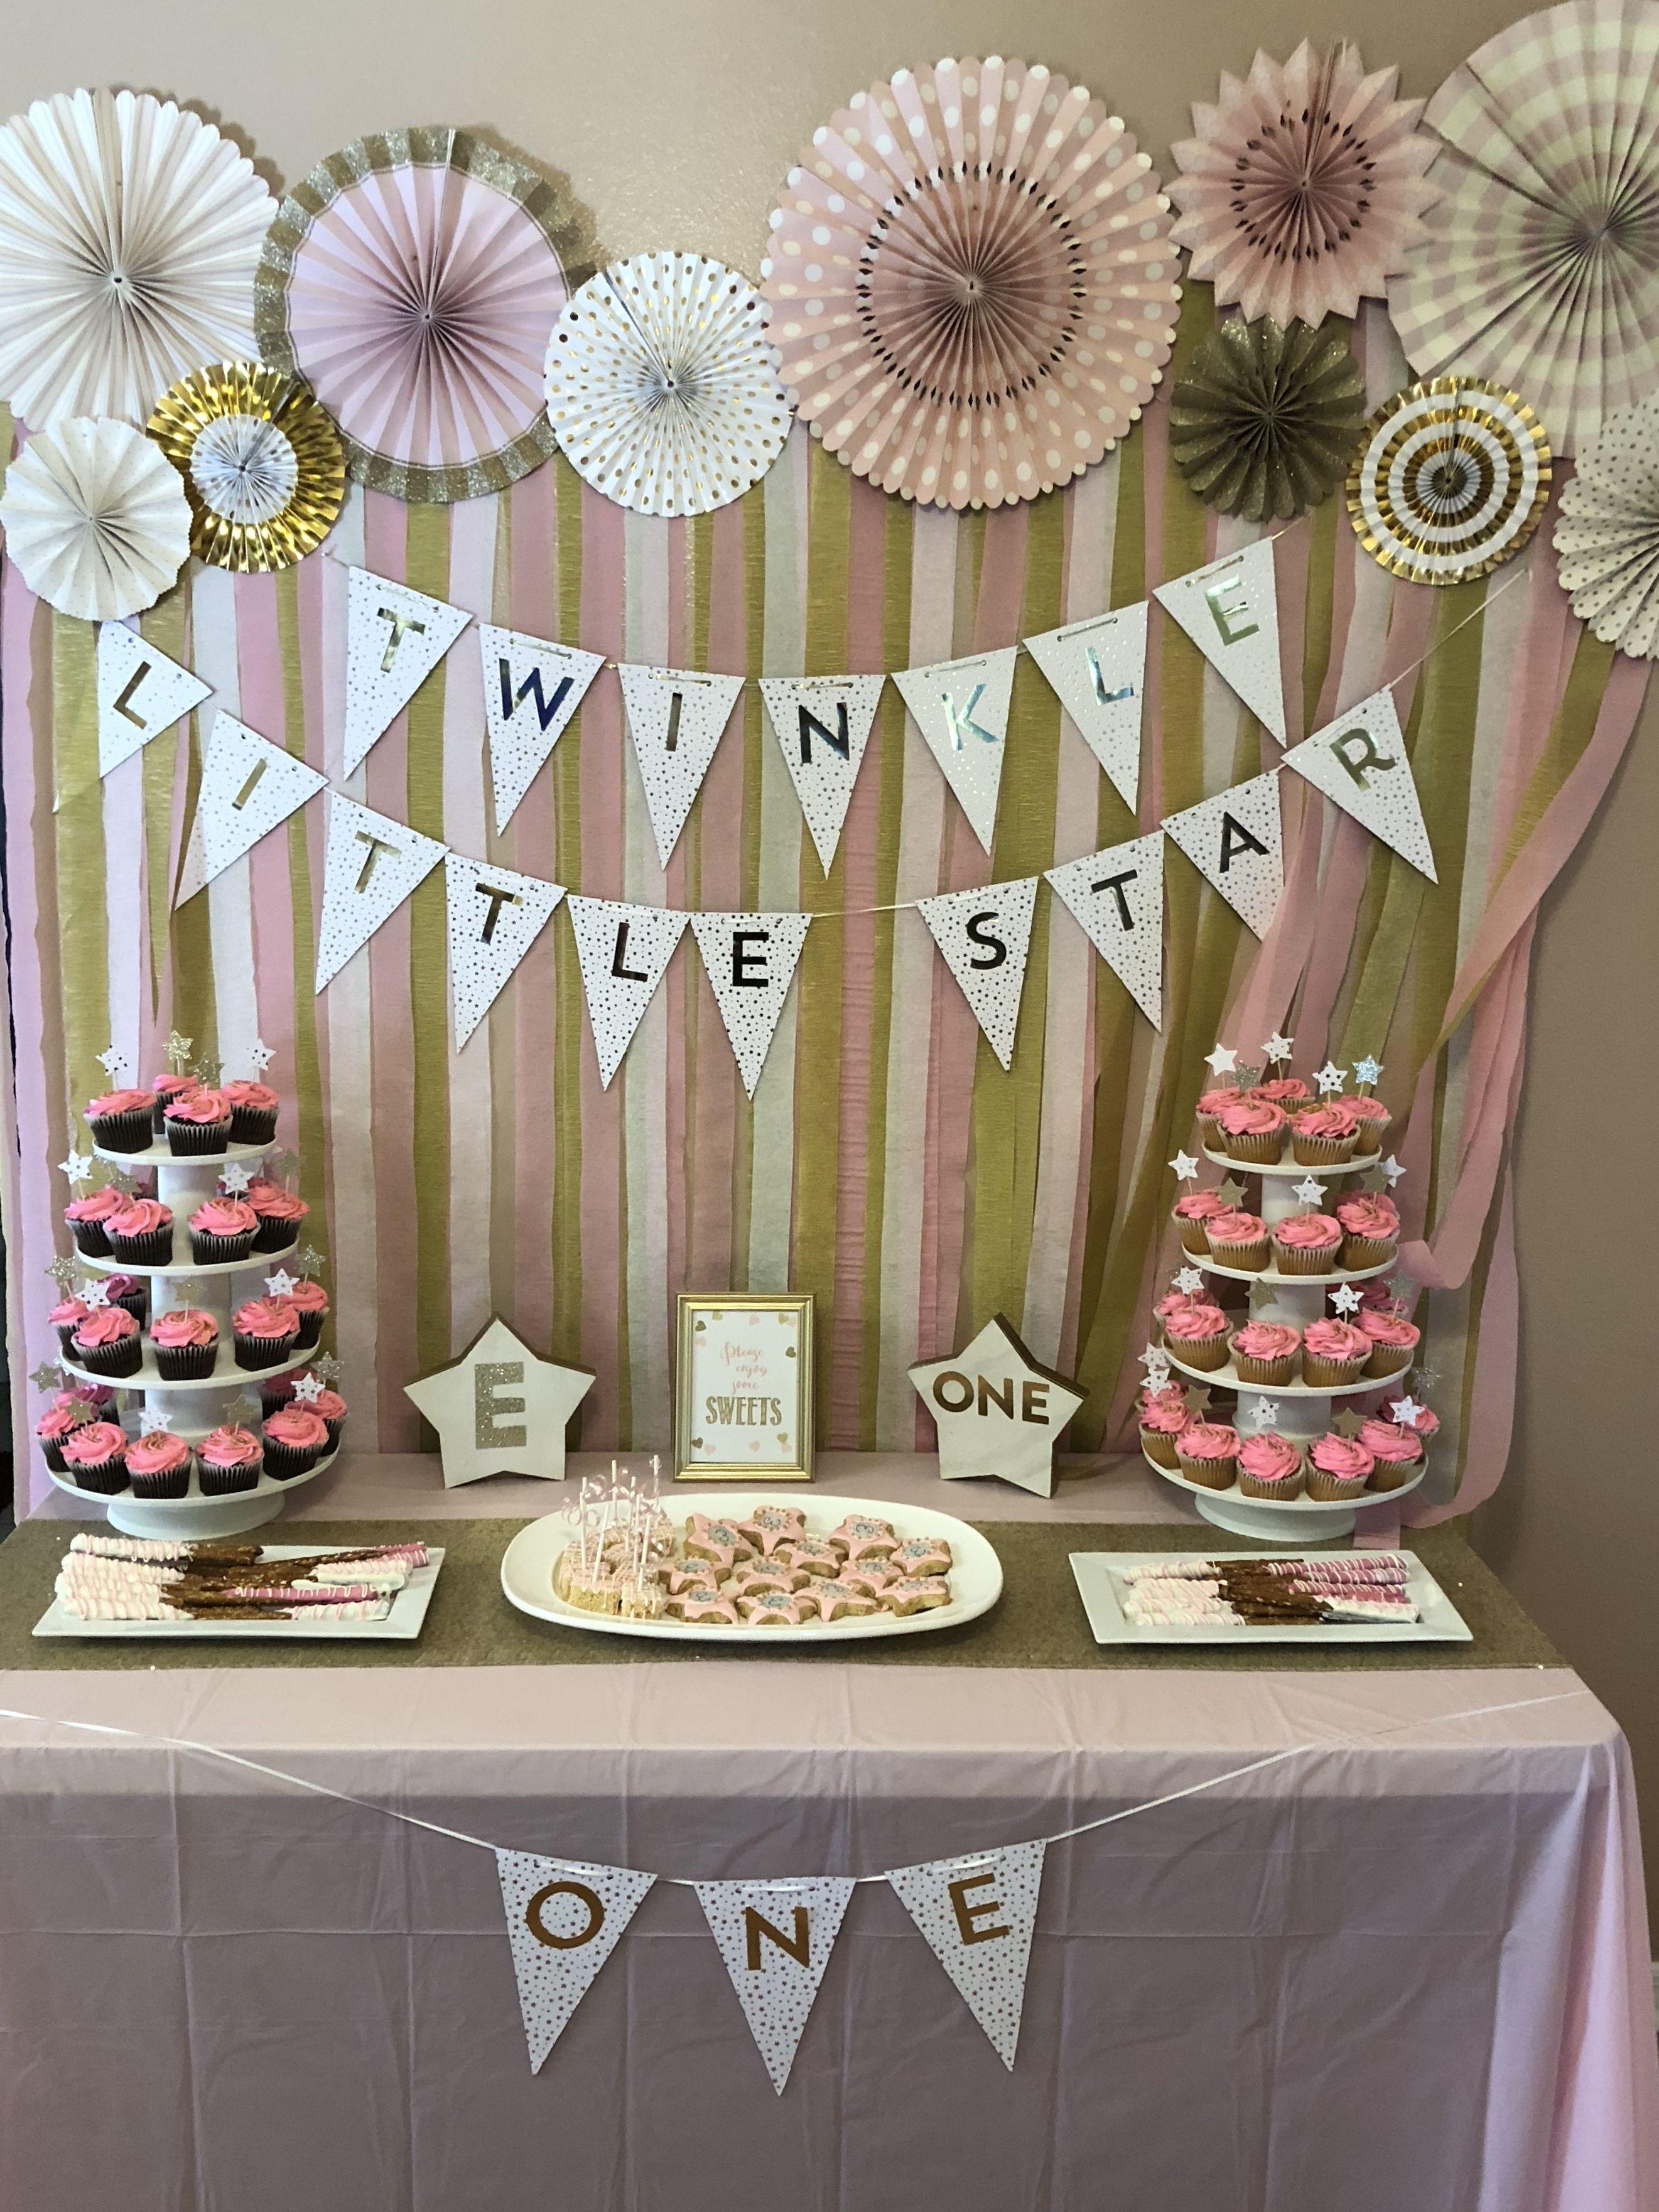 Twinkle Twinkle Little Star Birthday Dessert Table Pinkandgold